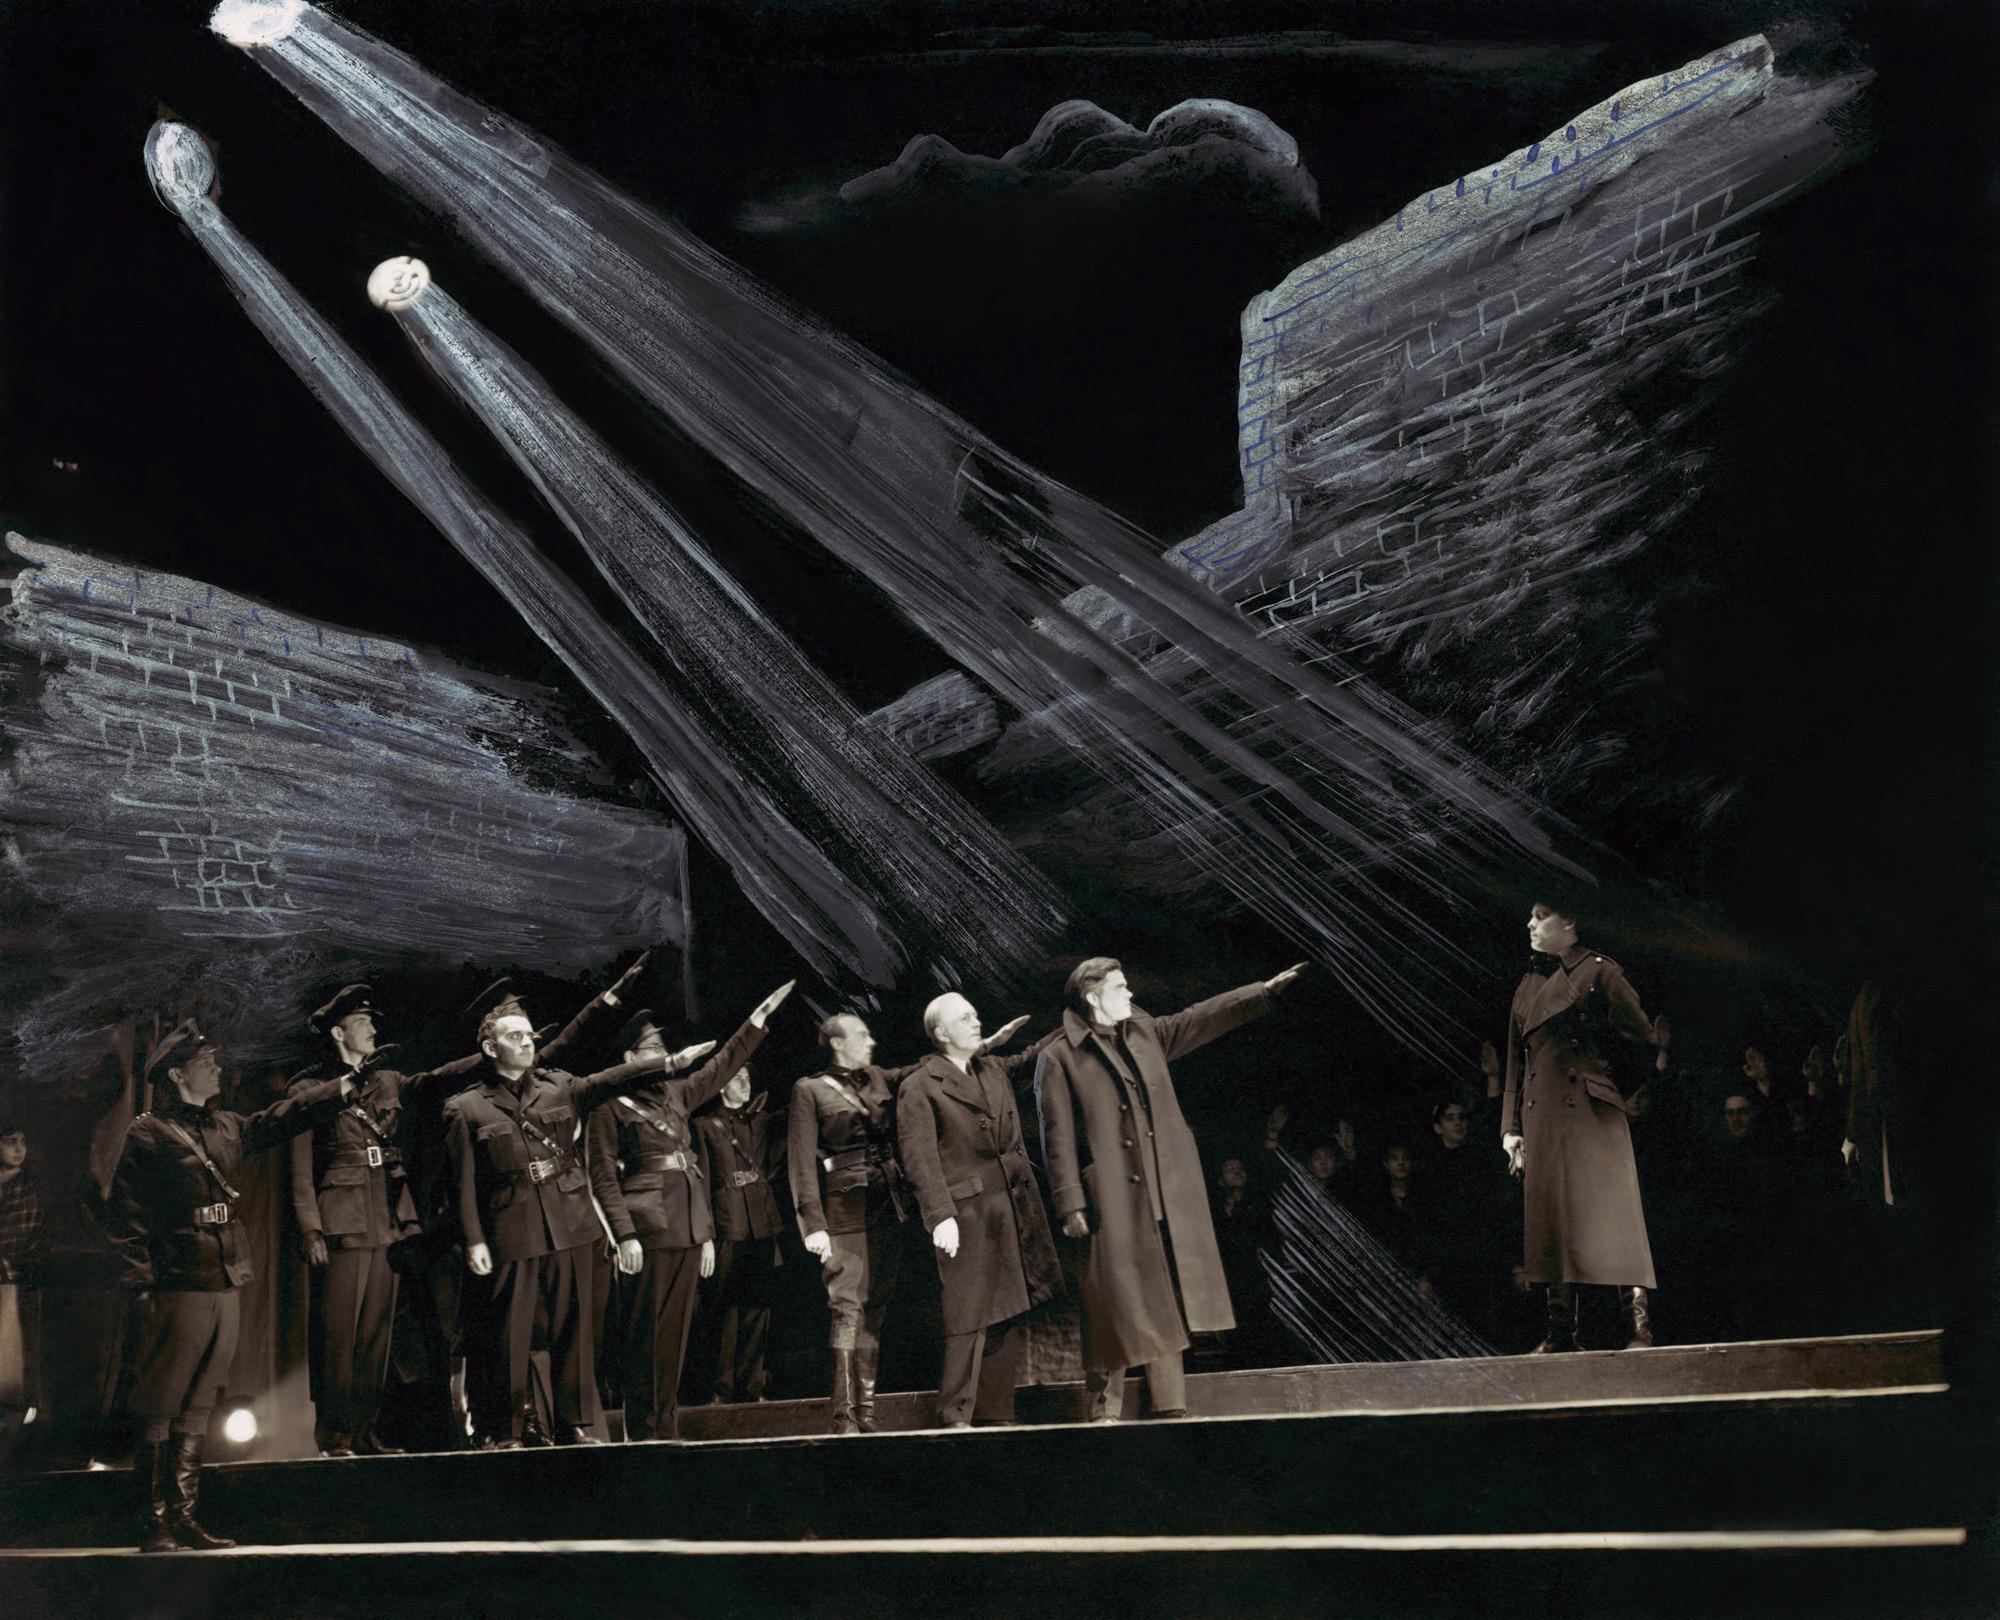 Photograph of Orson Welles as Brutus in Julius Caesar